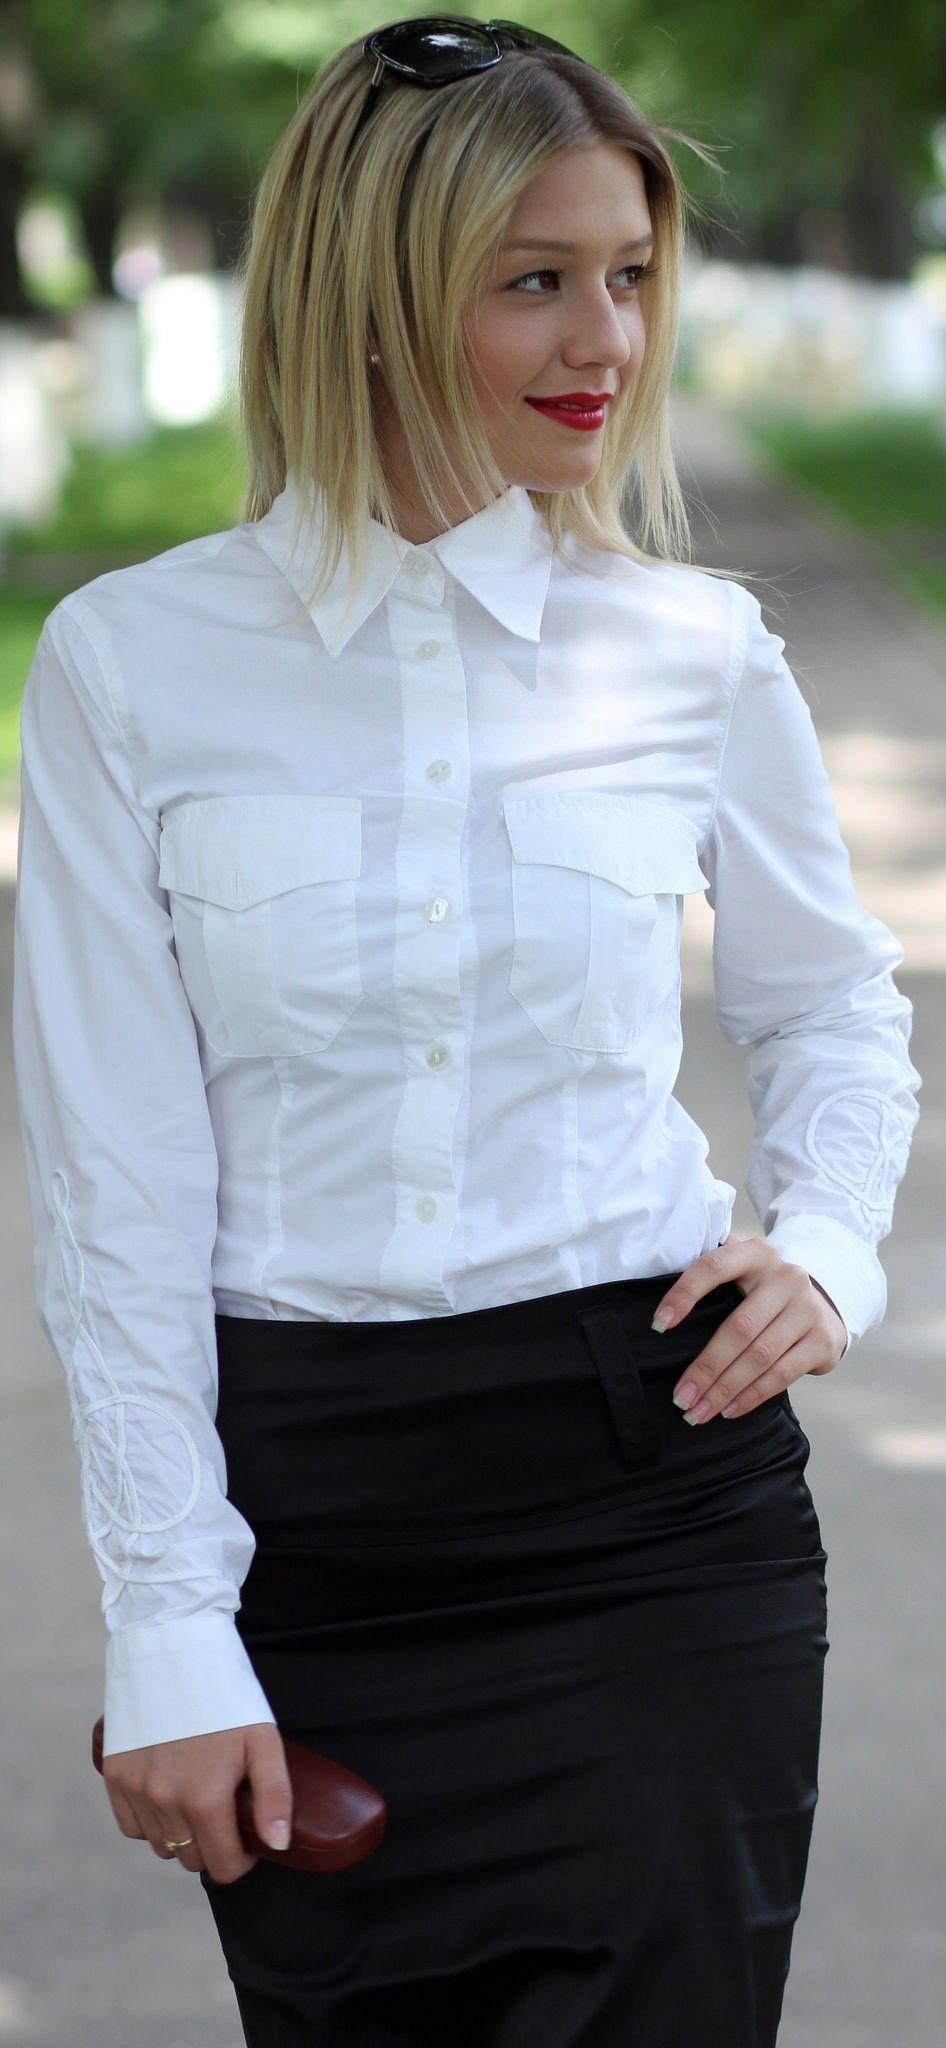 01149a317b21 Woman Shirt, Girls Wear, Collar Shirts, Collars, White Blouses, Button Up